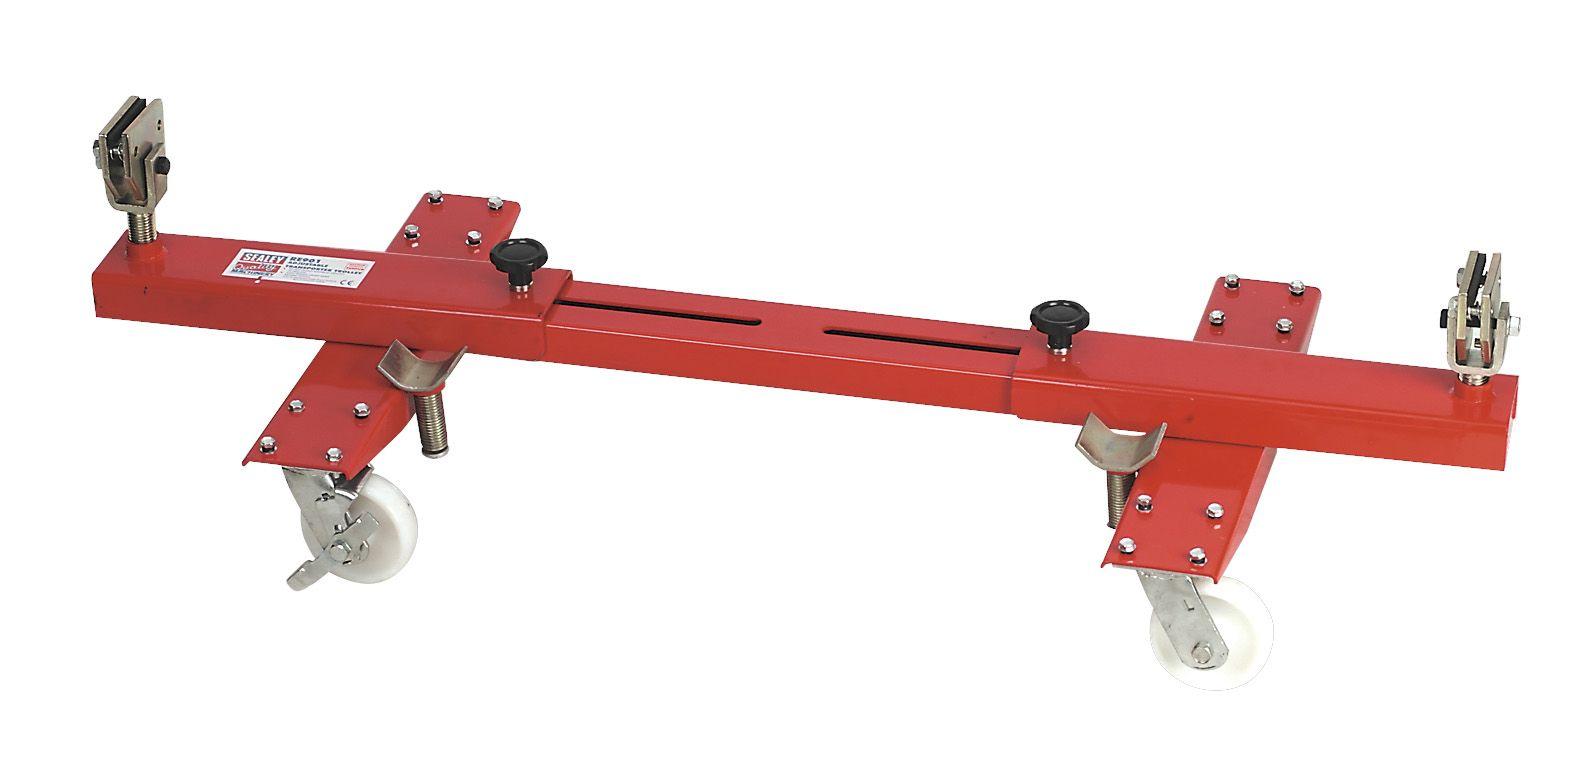 Sealey Adjustable Transportacar Trolley 2tonne Capacity